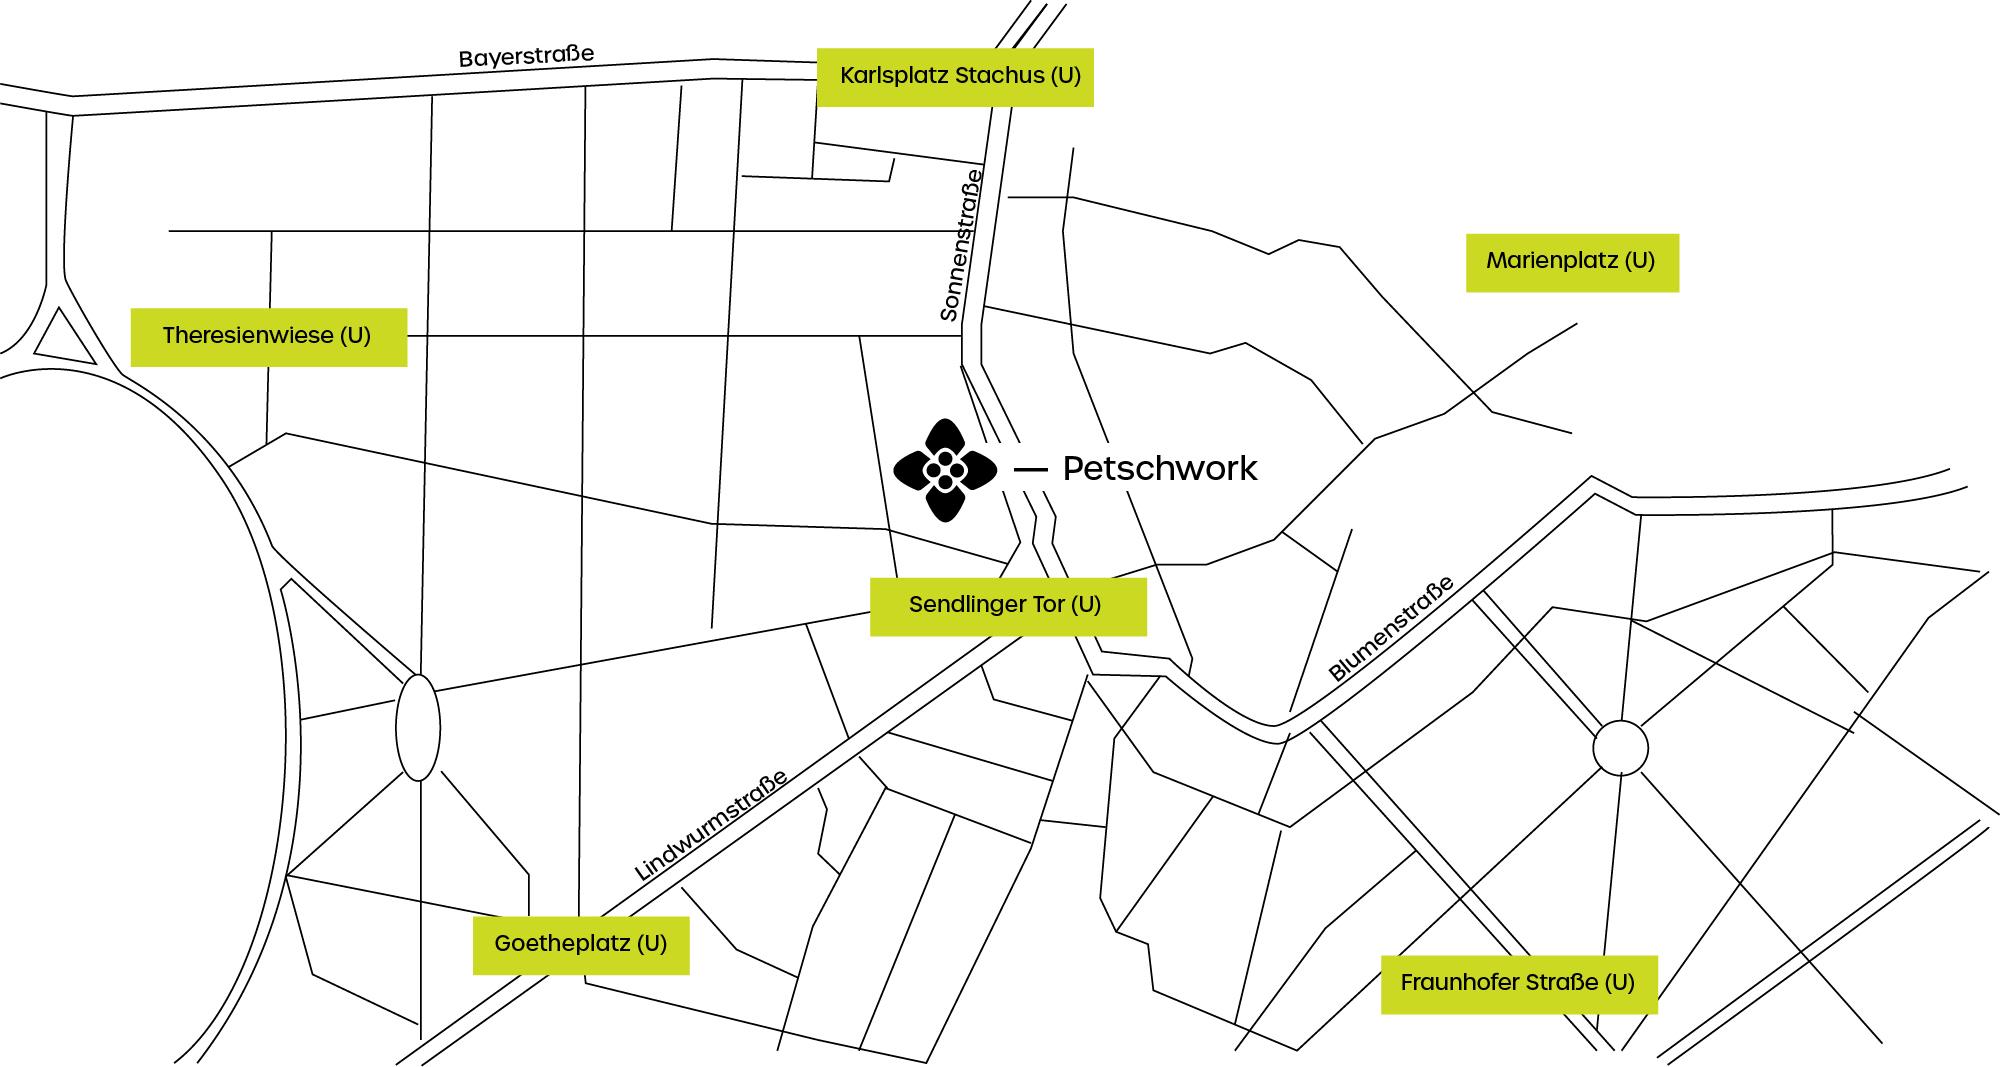 Petschwork Consulting München | All about students | Studentenbreatung | Zertifiziert. Erfahren. Anders | Kontakt | Anfahrtsskizze